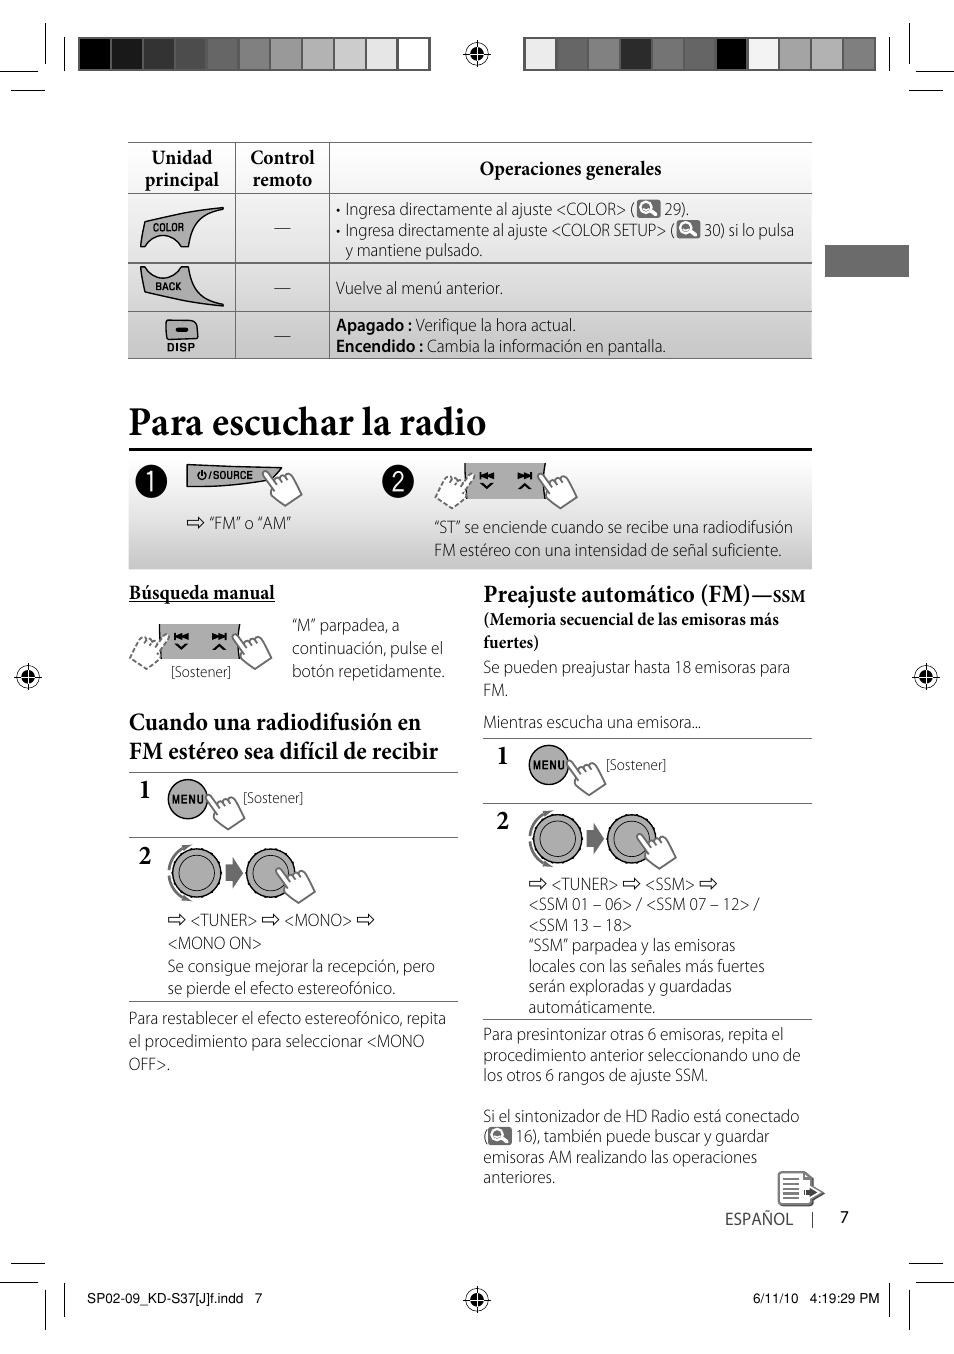 para escuchar la radio preajuste autom tico fm jvc kd s37 user rh manualsdir com jvc kd s37 user manual JVC KD- AVX77